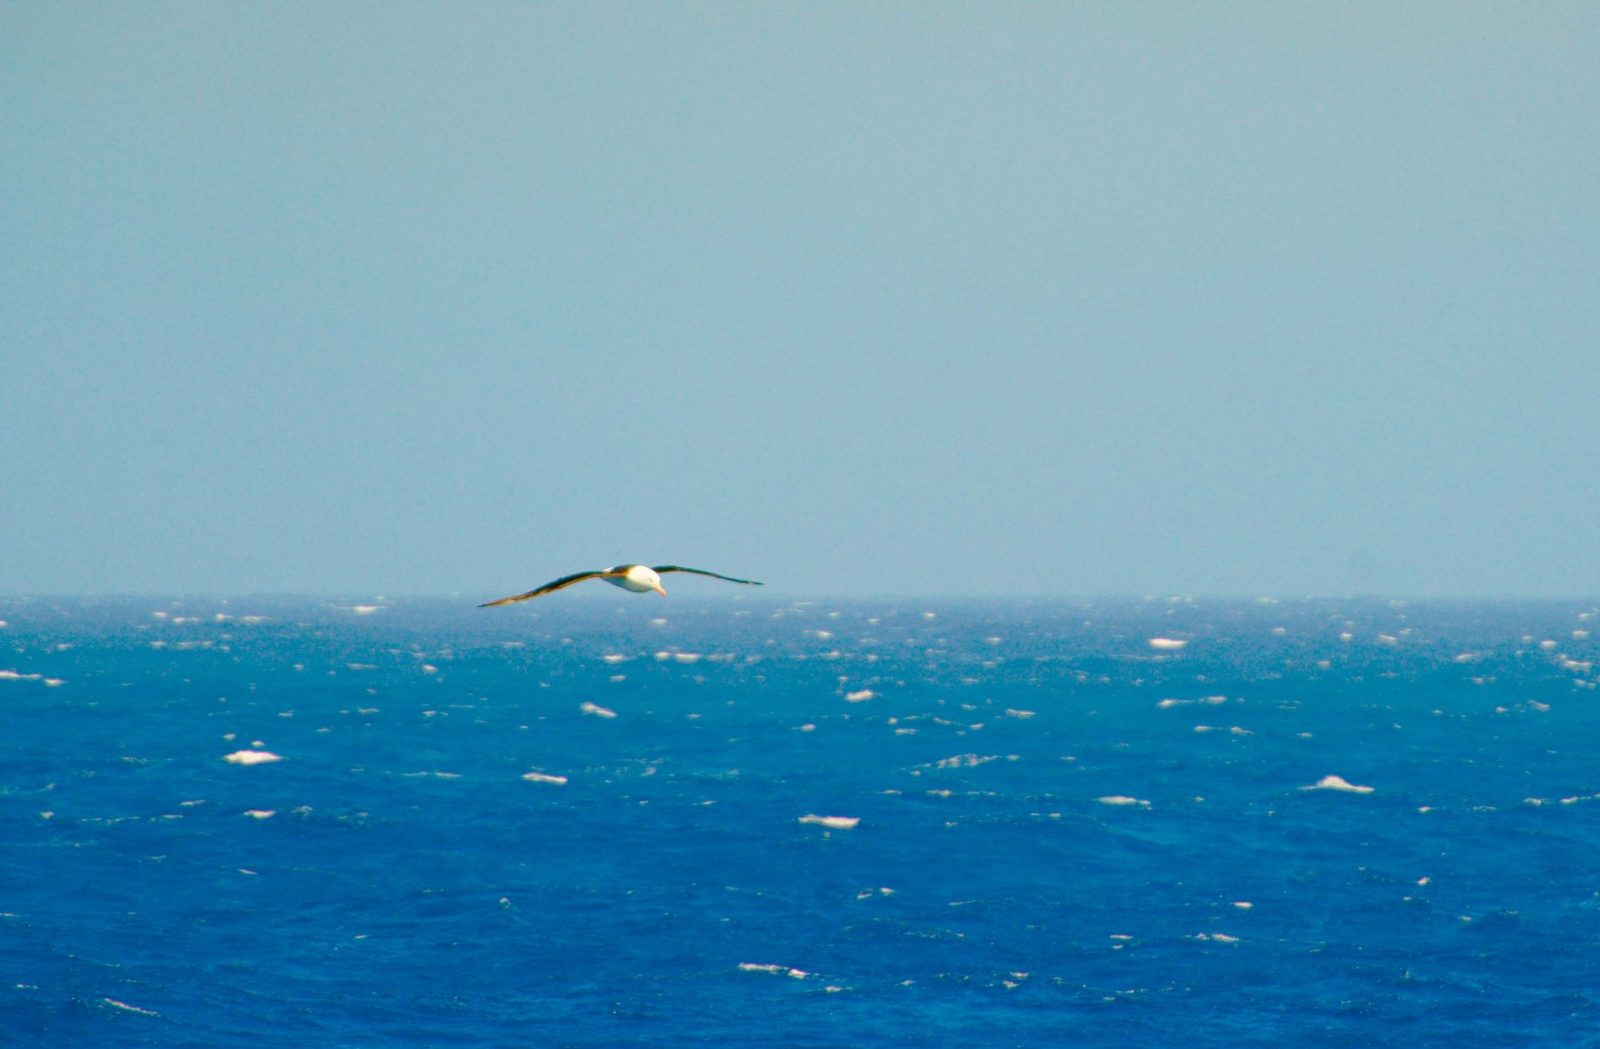 Black-browed albatross gliding over deep blue waves